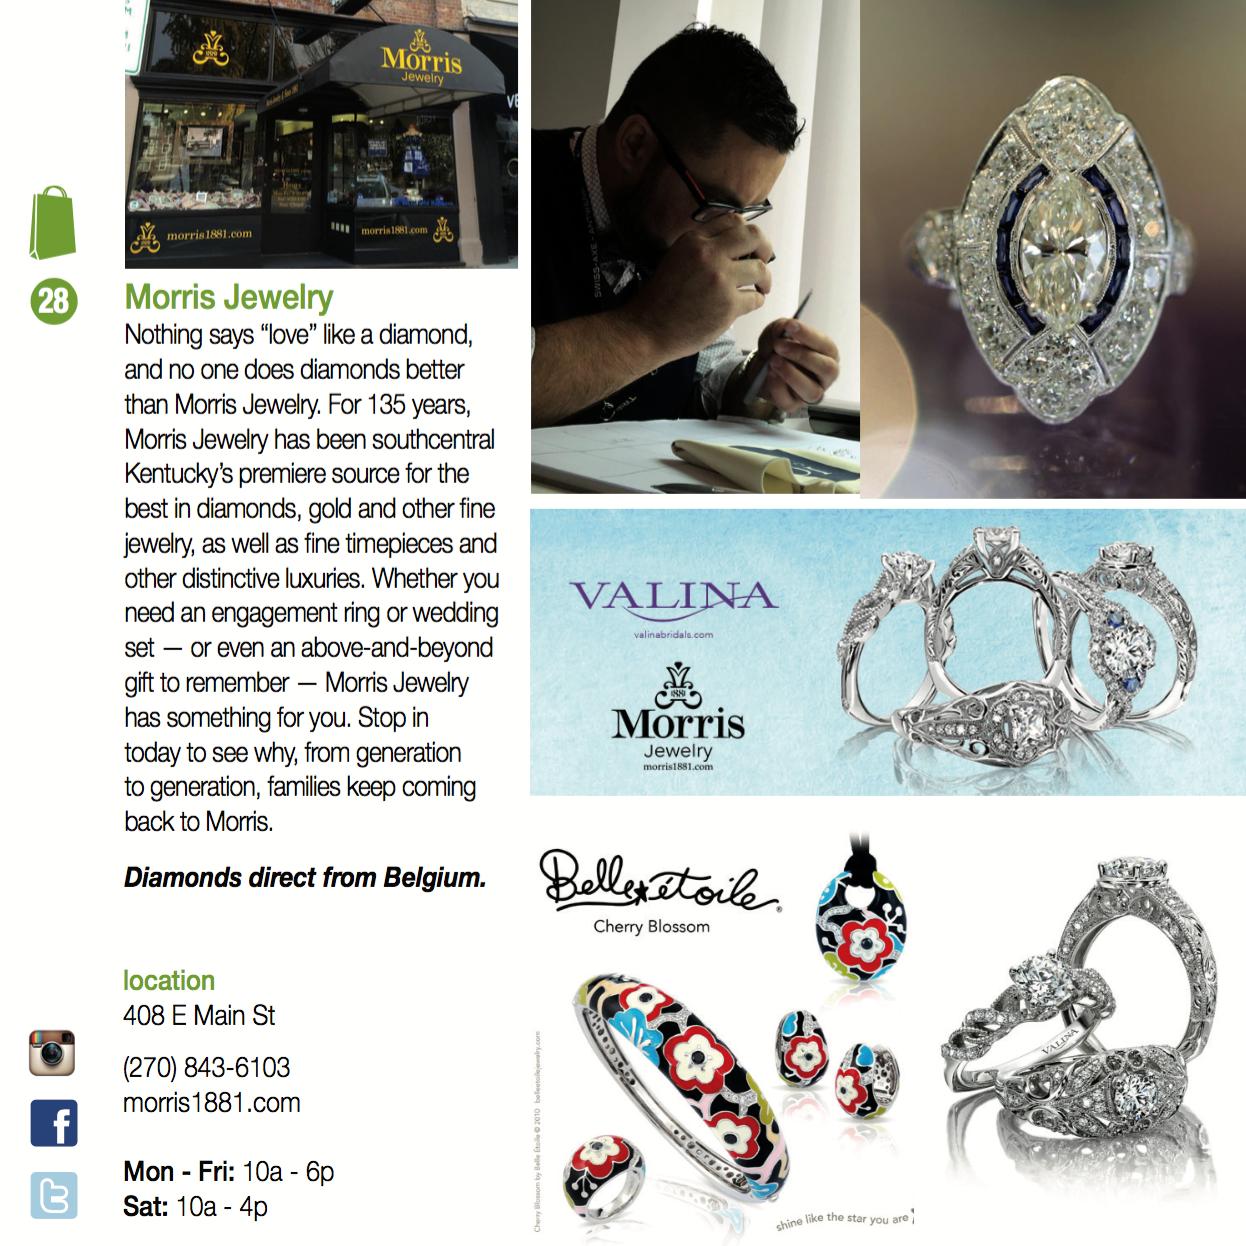 Morris Jewelry